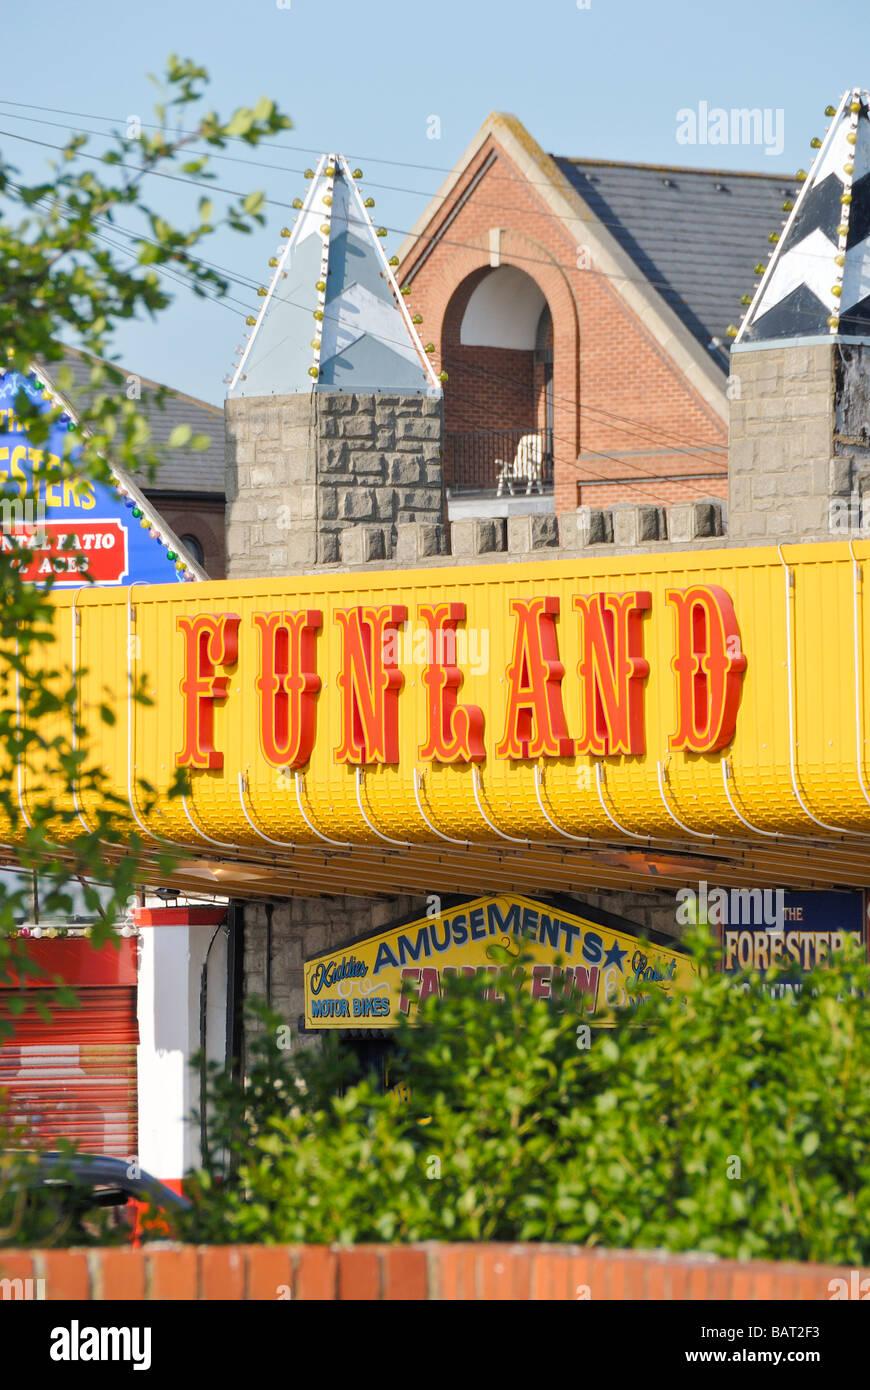 Funland Southend on Sea Essex England UK - Stock Image